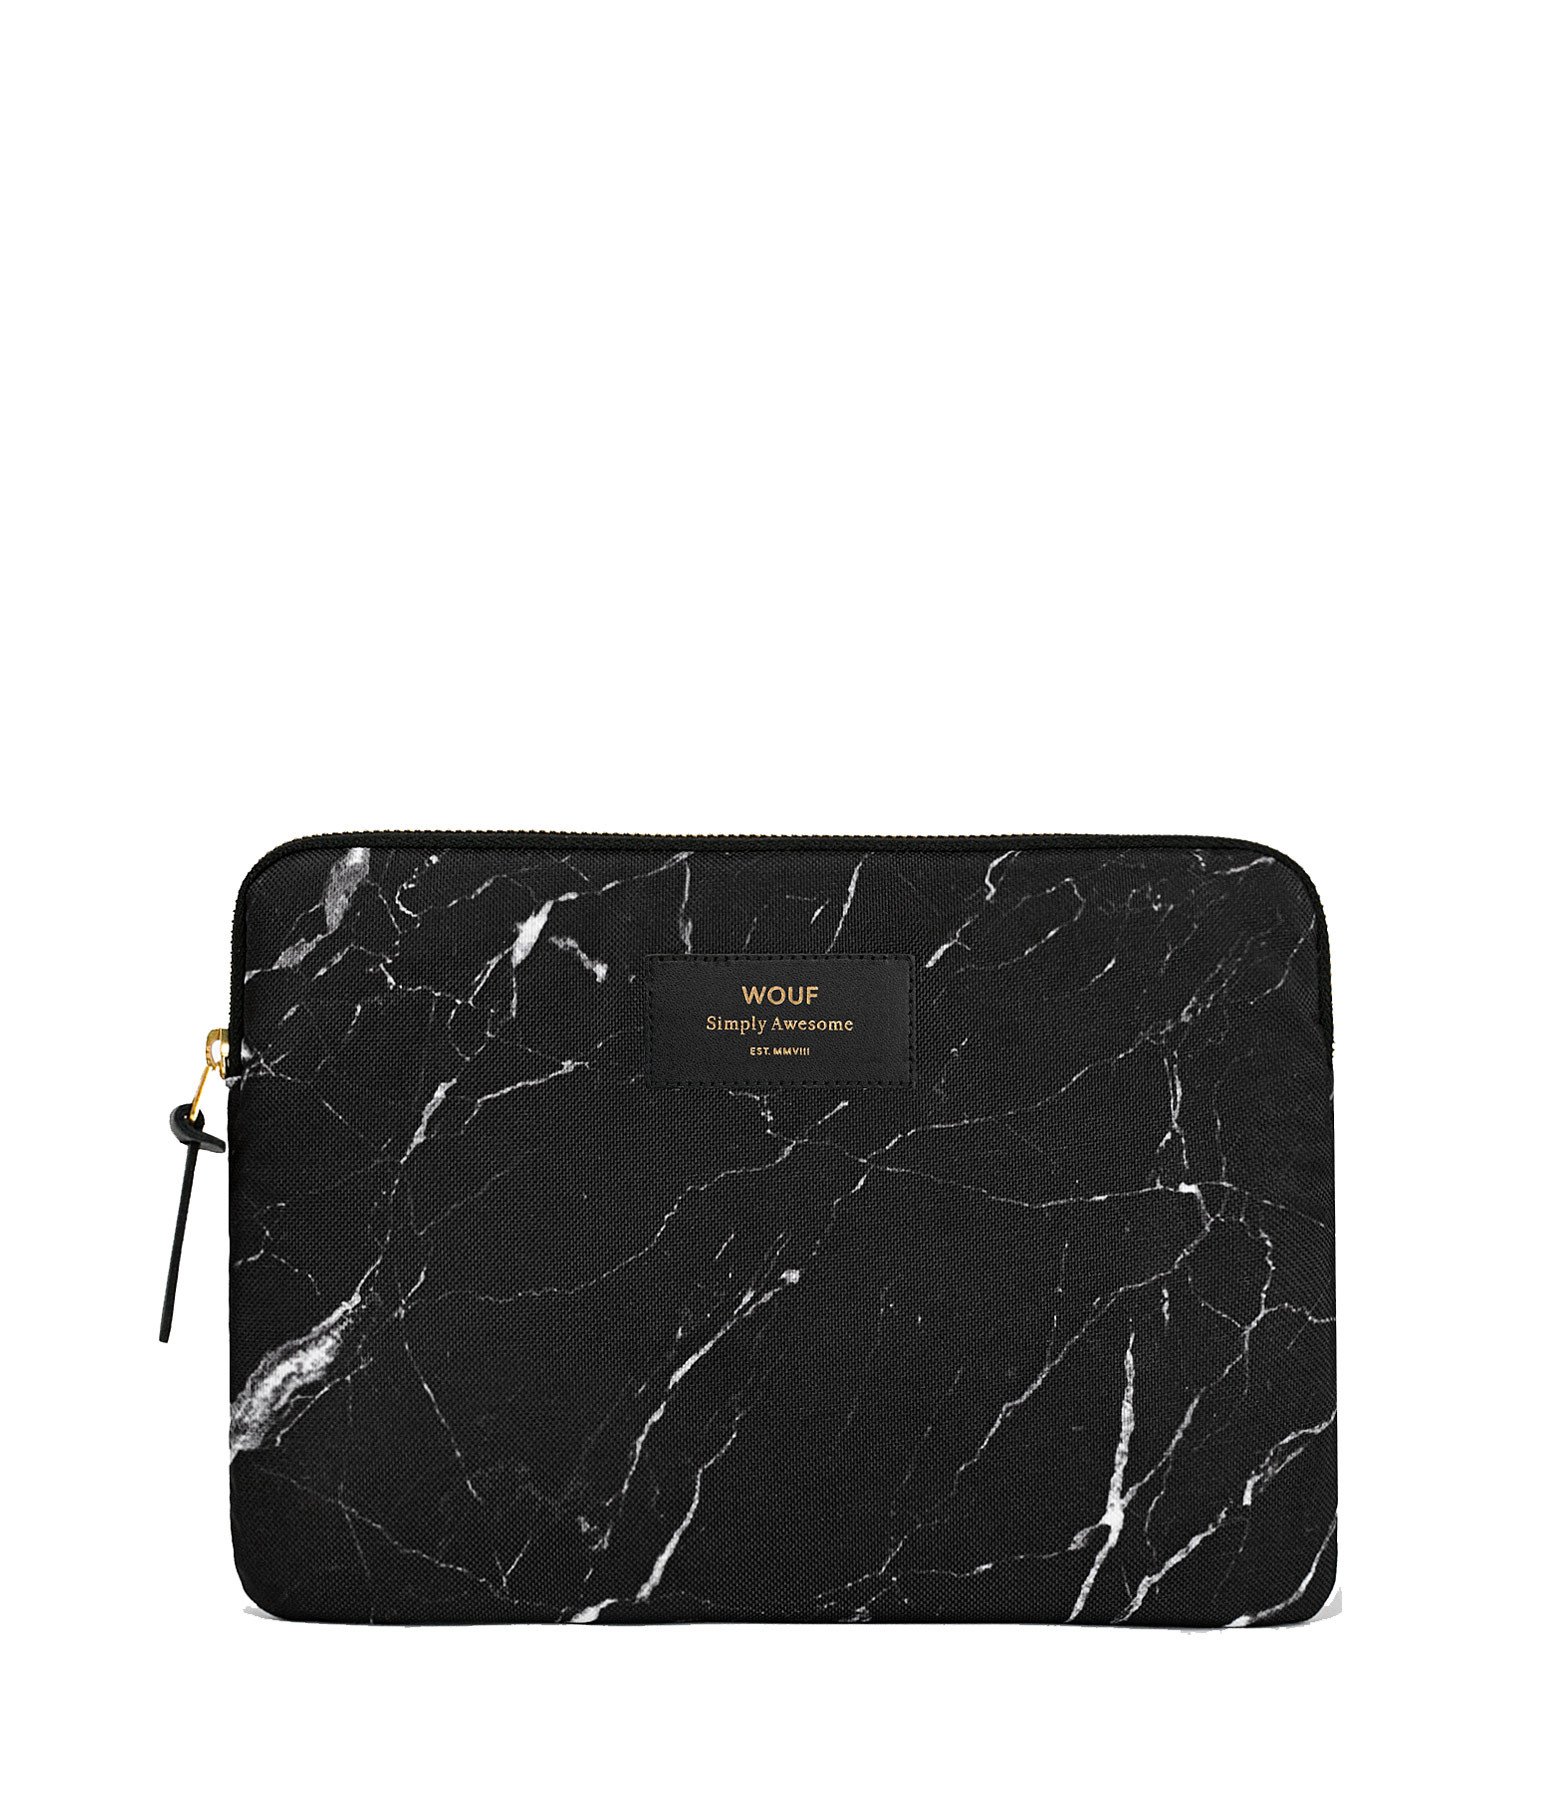 WOUF - Housse Ipad Black Marble